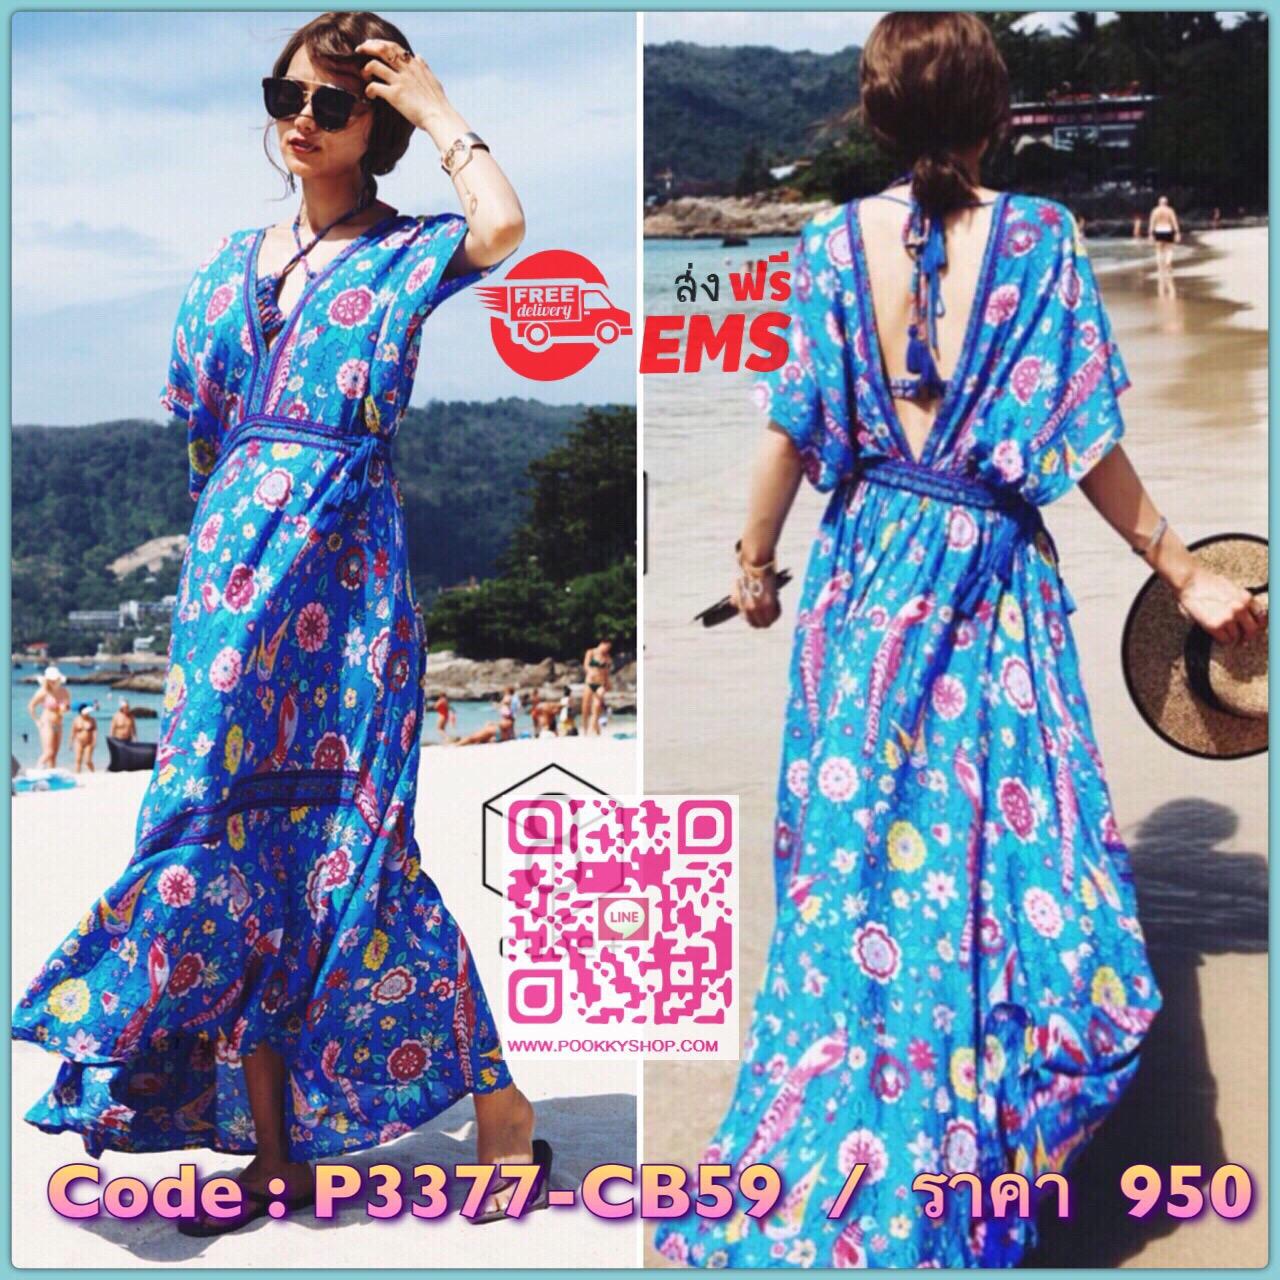 bohemain happy fresh blue maxi dress::: เดรสแม๊กซี่สไตล์โบฮีเมียม สีฟ้าเข้มสด ผ้าดีสีไม่ตก ใช้ผ้าฝ้ายแท้ที่มีเนื้อนิ่มนุ่มมาก การันตีคุณภาพ ราคาเกินคุ้ม ใส่ออกมาแปลงมาสาวยิปซีขึ้นมาทันที ช่วงเอวเป็นยางยืดรอบพร้อมผูกข้าง ใส่กระชับไม่ต้องกลัวโป๊เลยจ้า